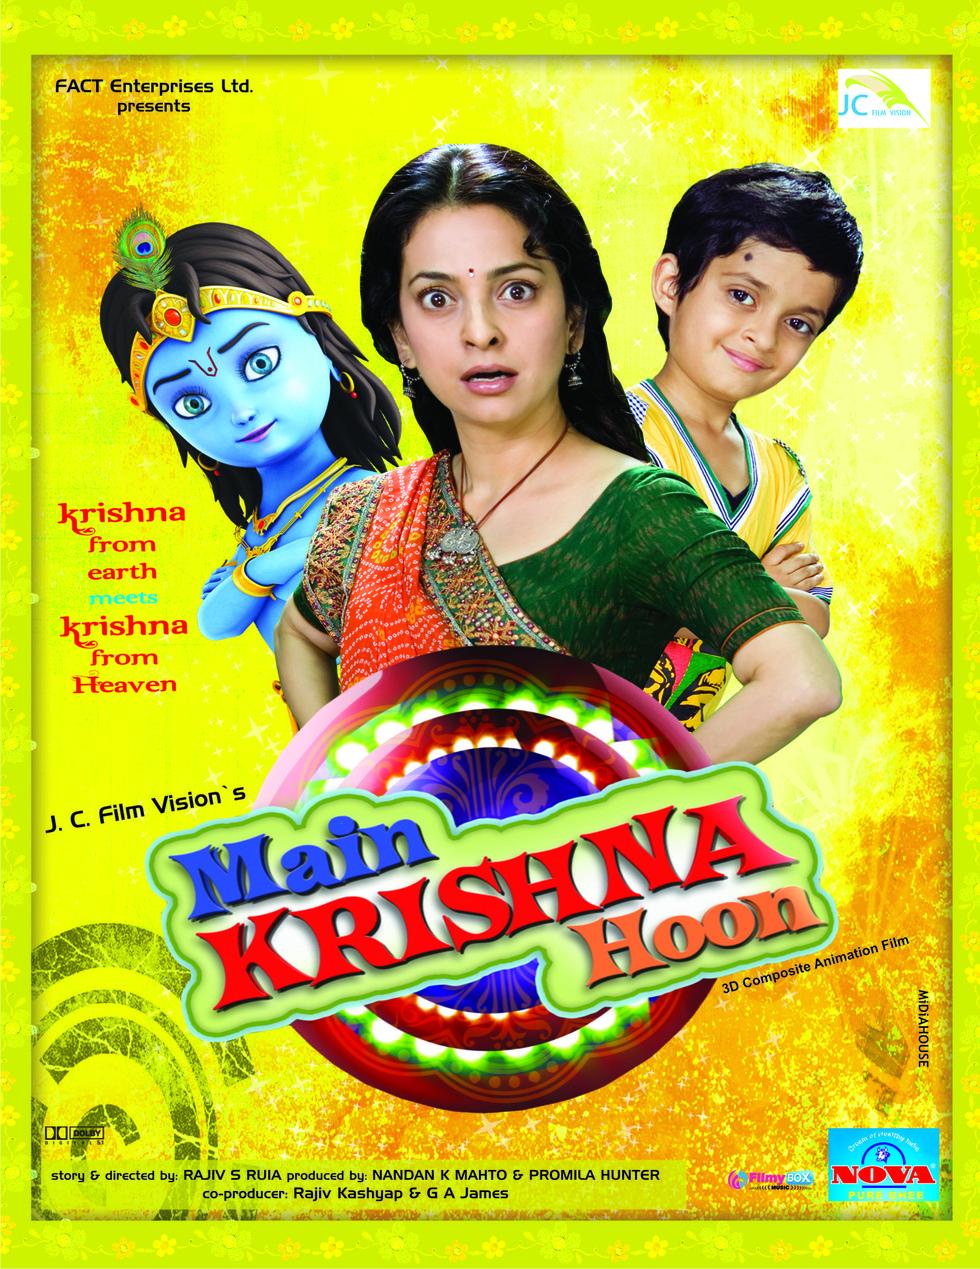 Main Krishna Hoon - Movie Poster #2 (Large)